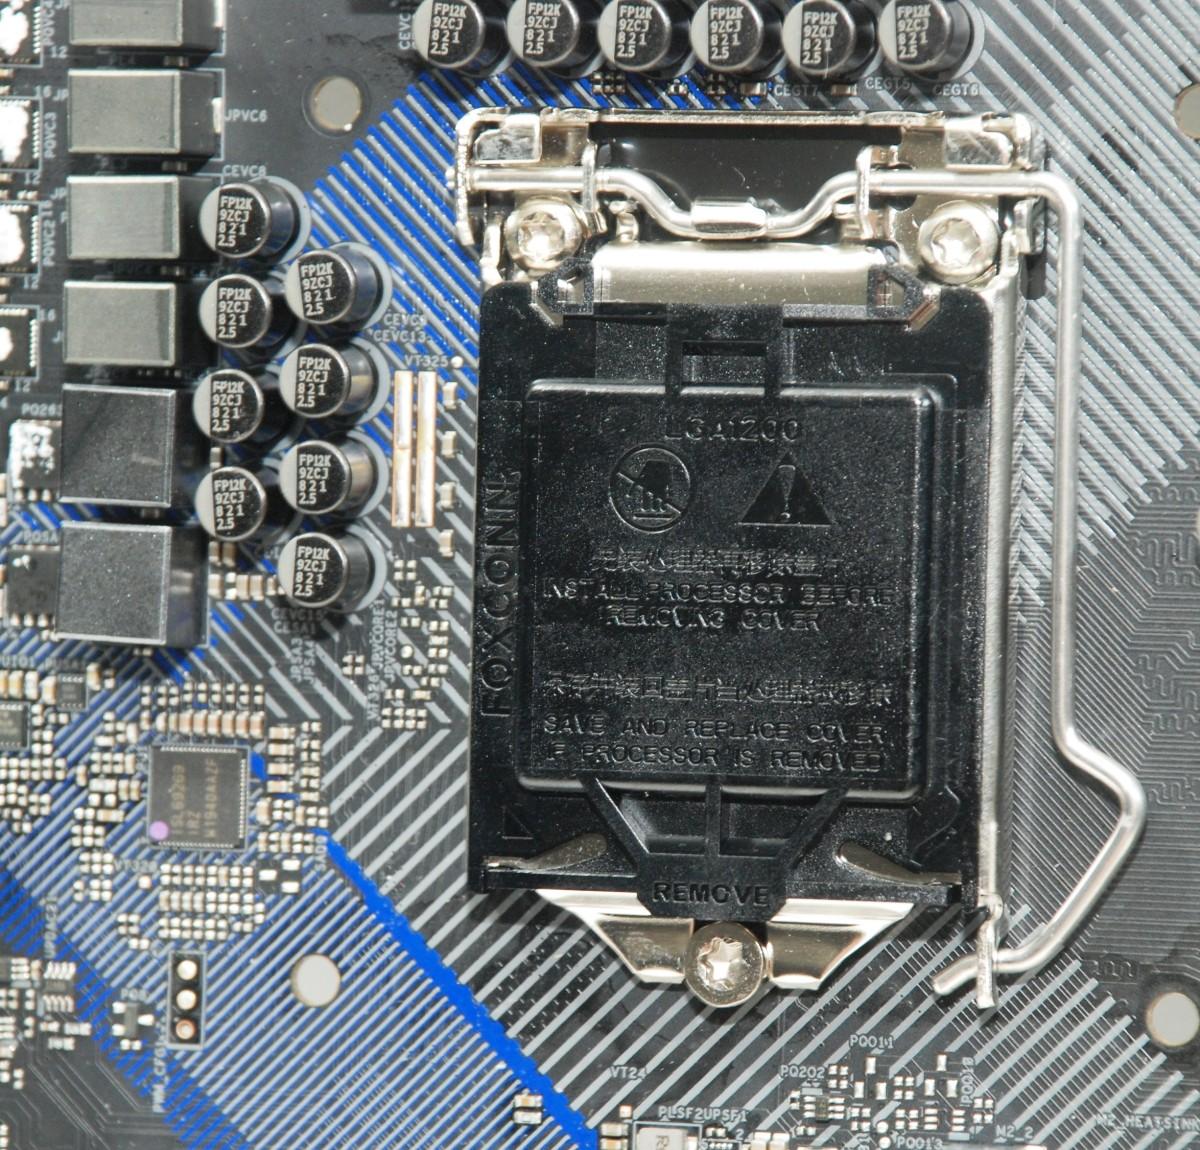 採用 Foxconn 品牌 Socket